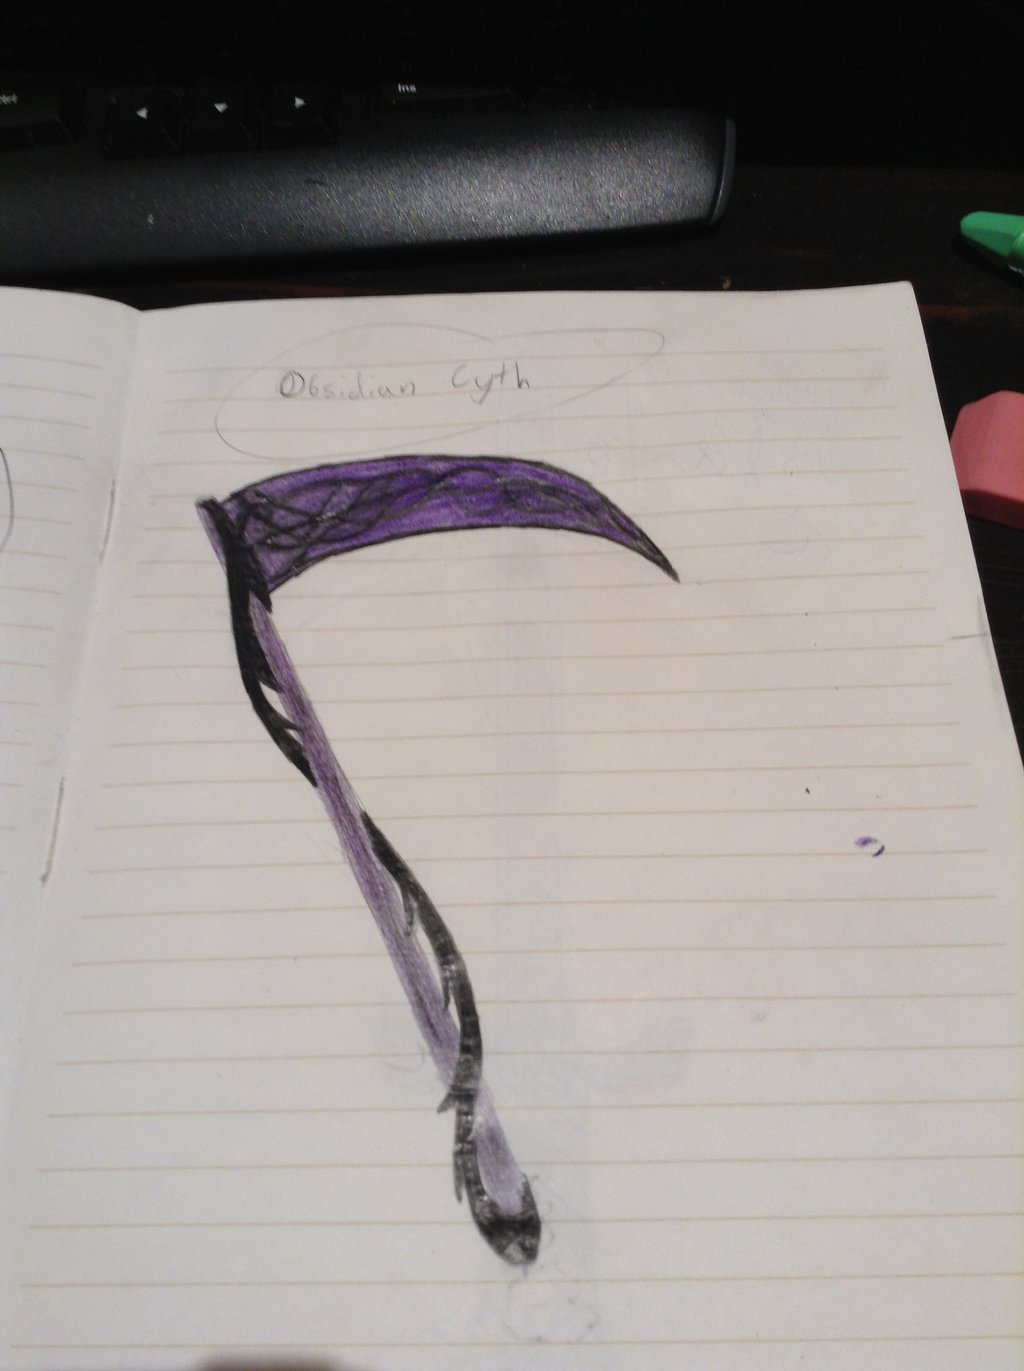 Drawn scythe purple DeviantArt by Gem Starfire1511 Obsidian